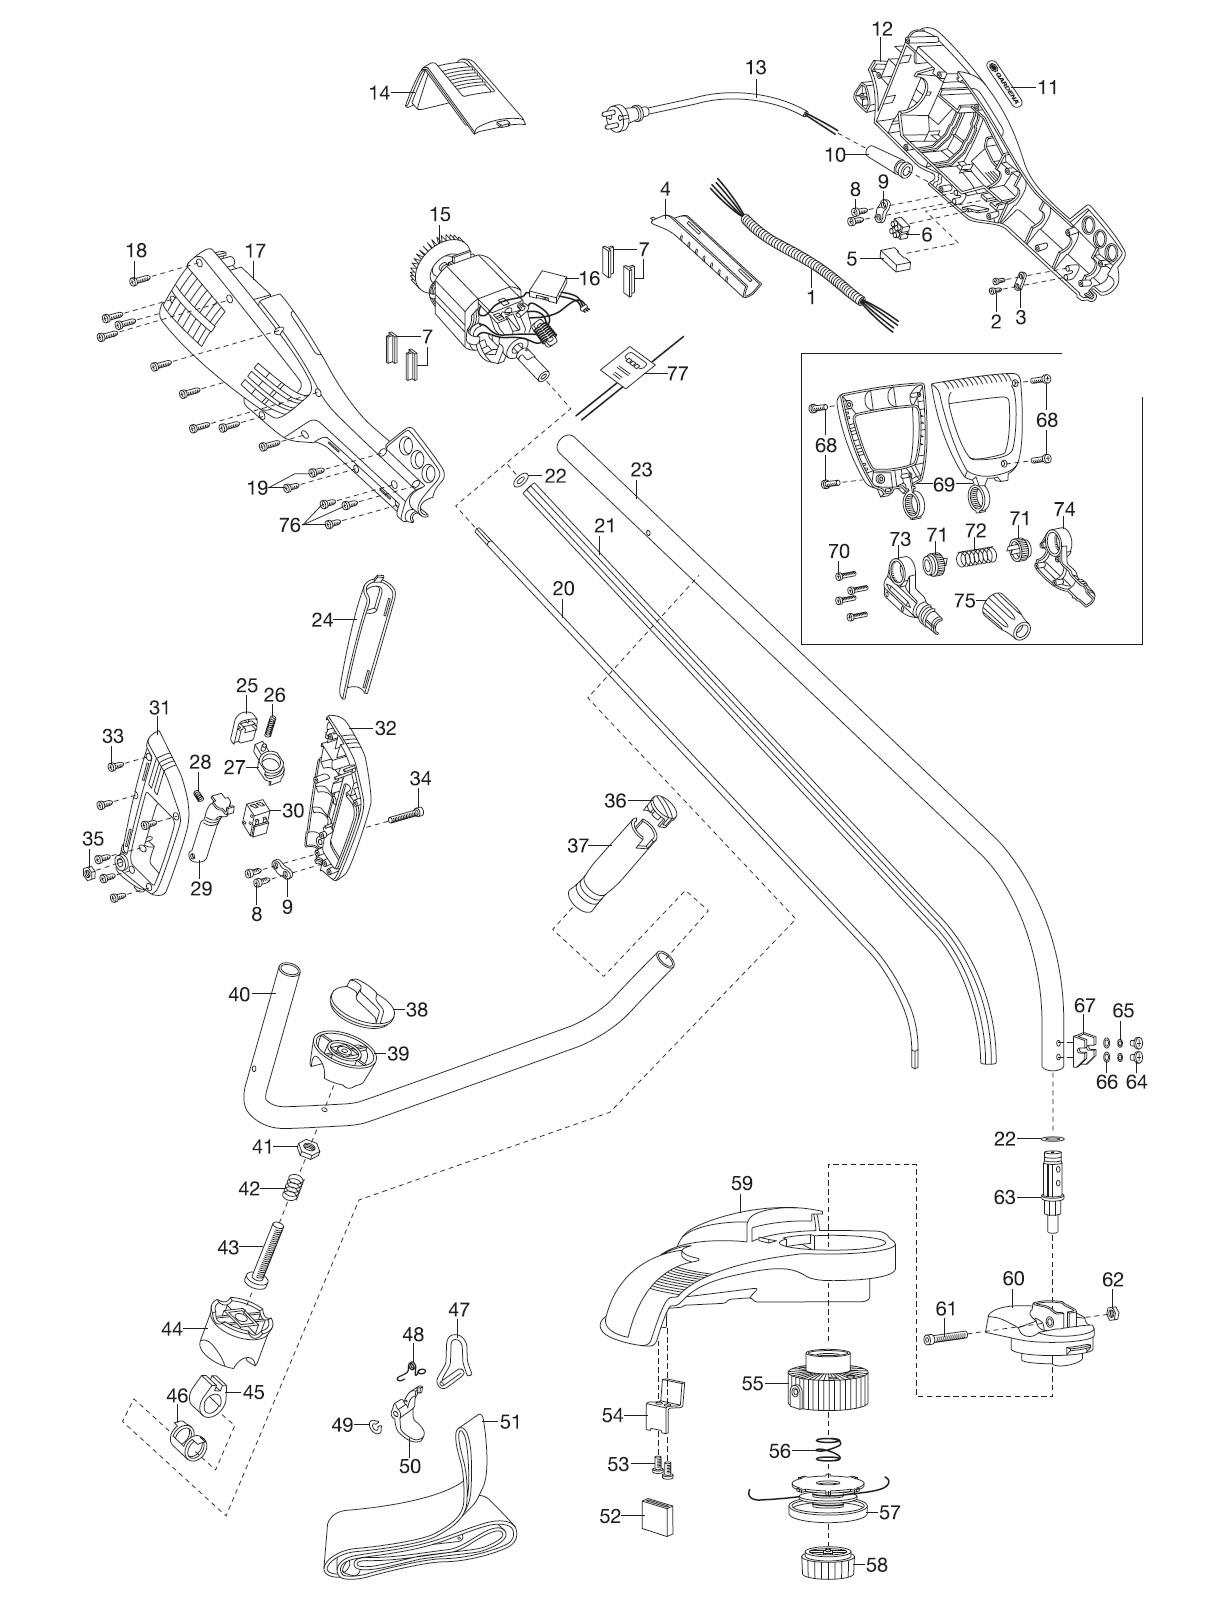 Ersatzteile Gardena Turbotrimmer Procut 800 8851 Ersatzteil Fee